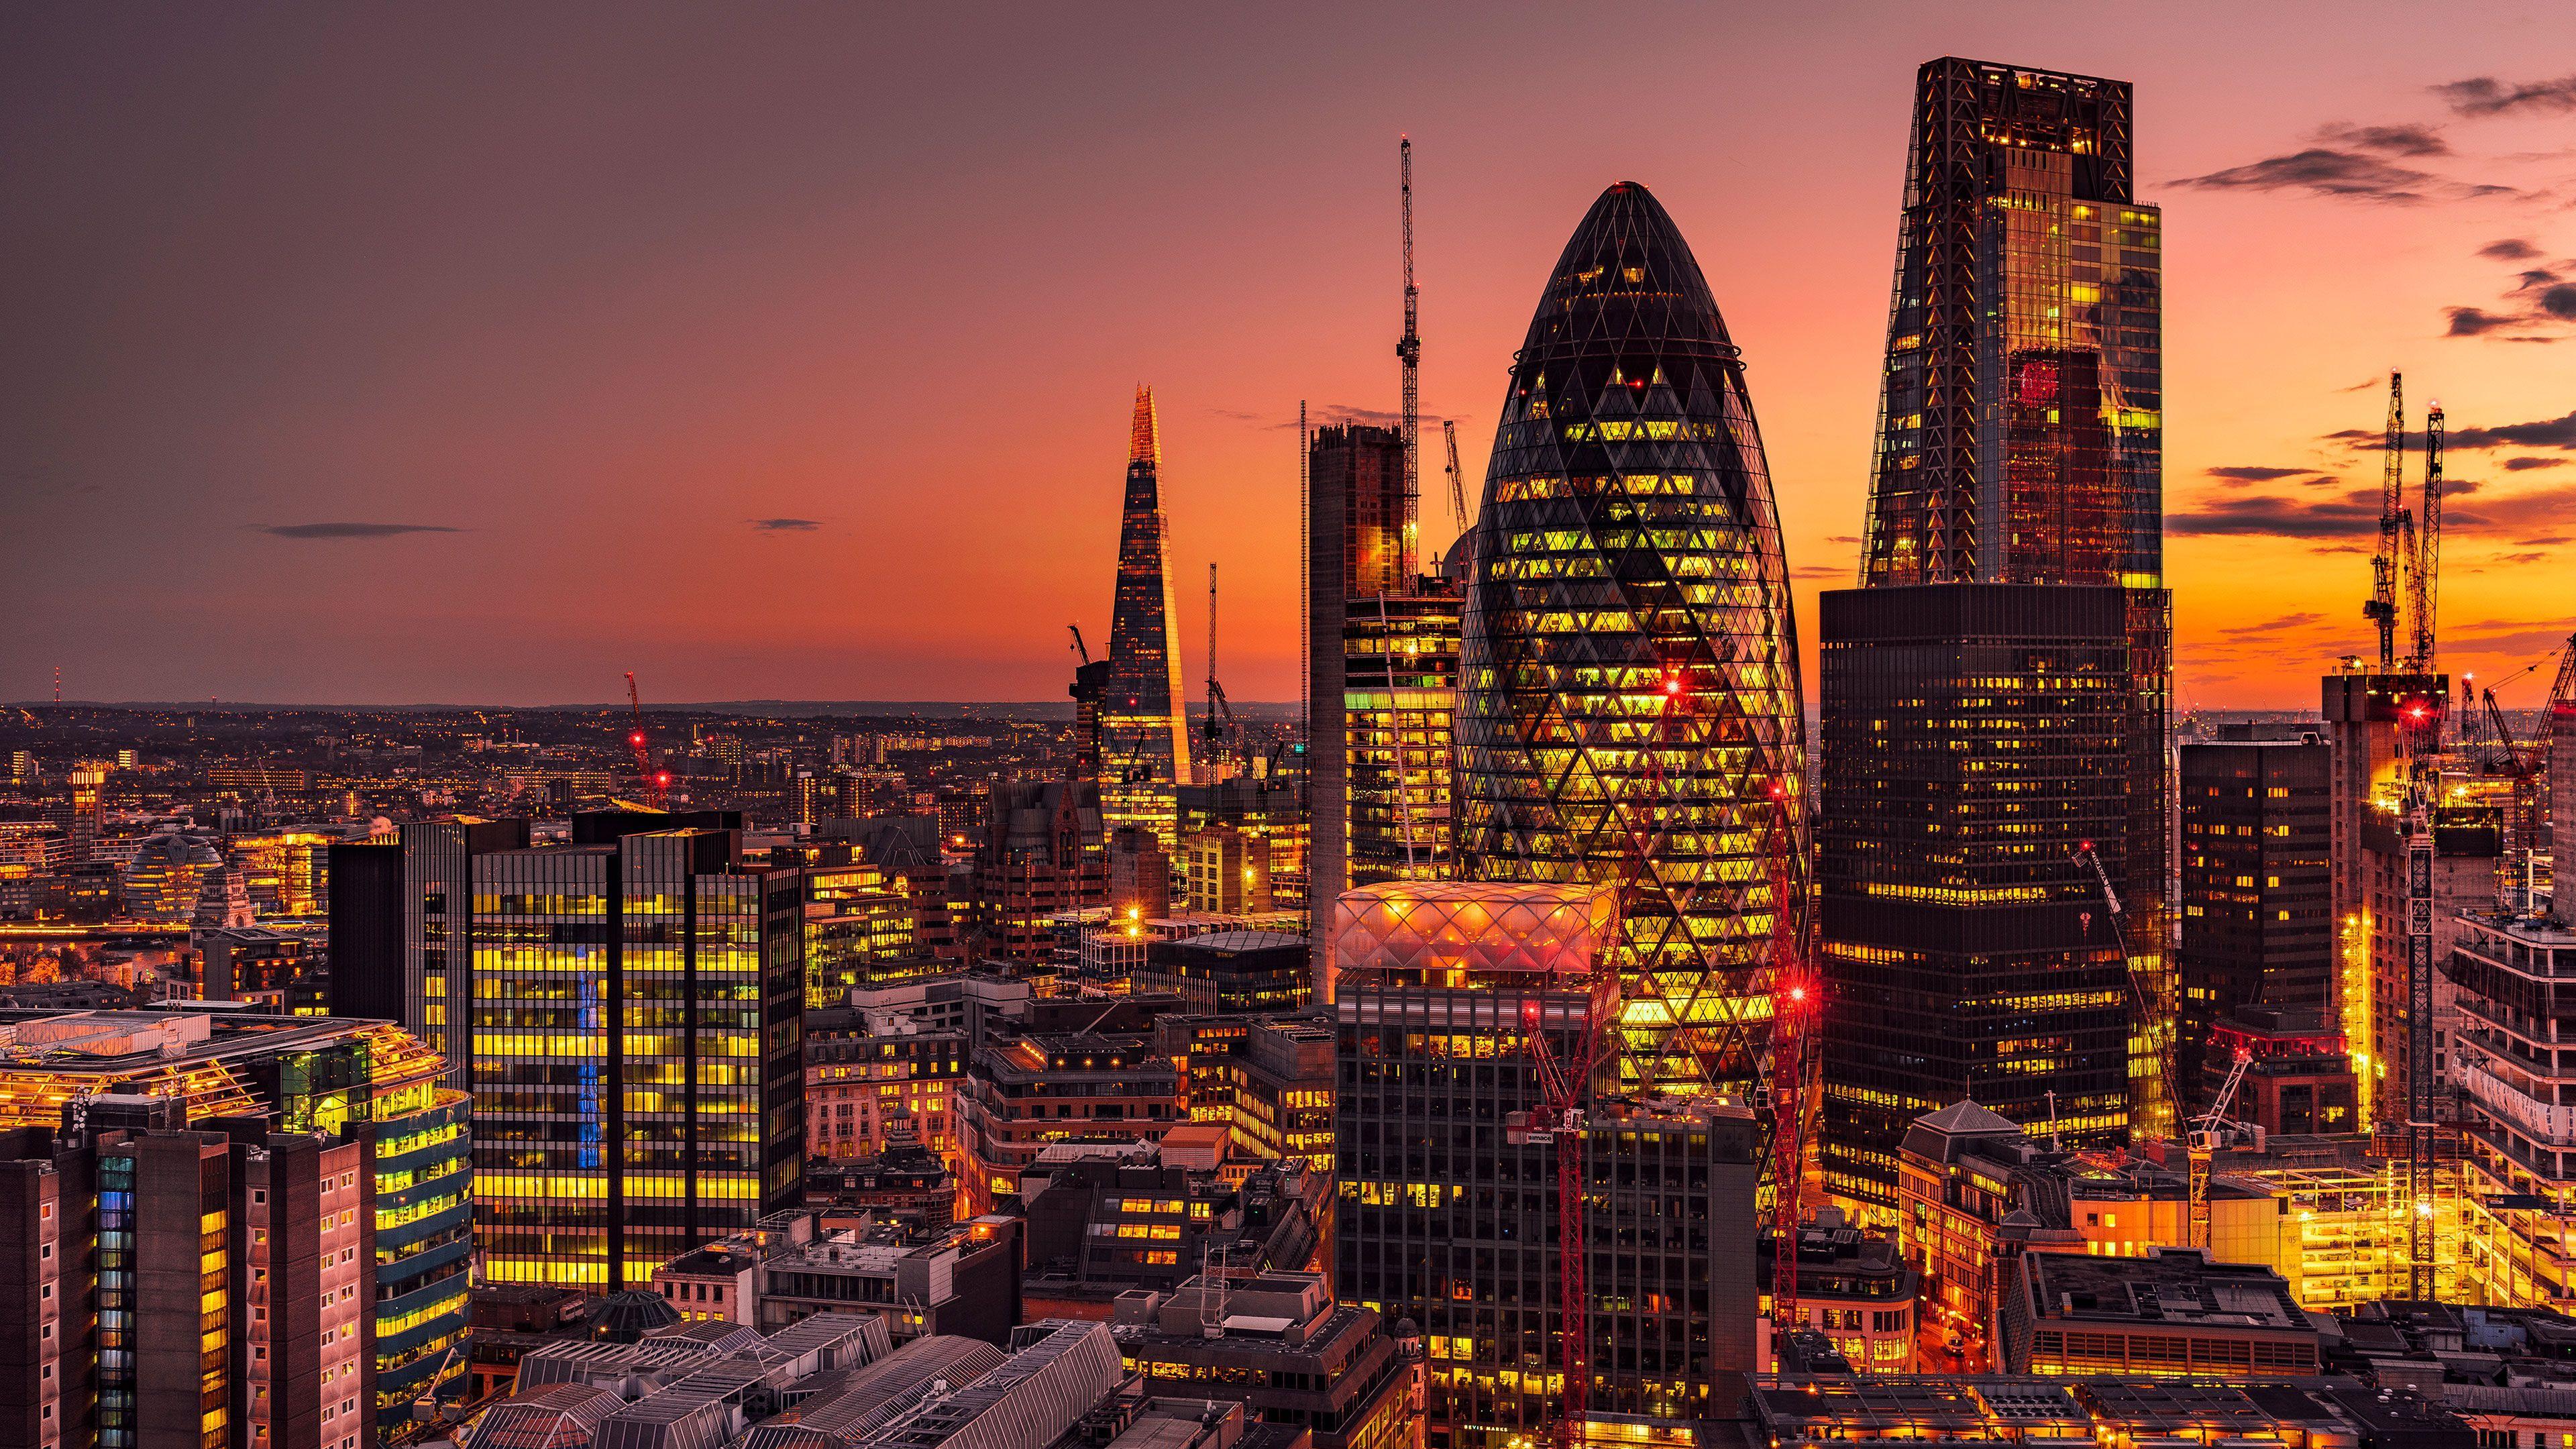 4K London Wallpapers - Top Free 4K ...